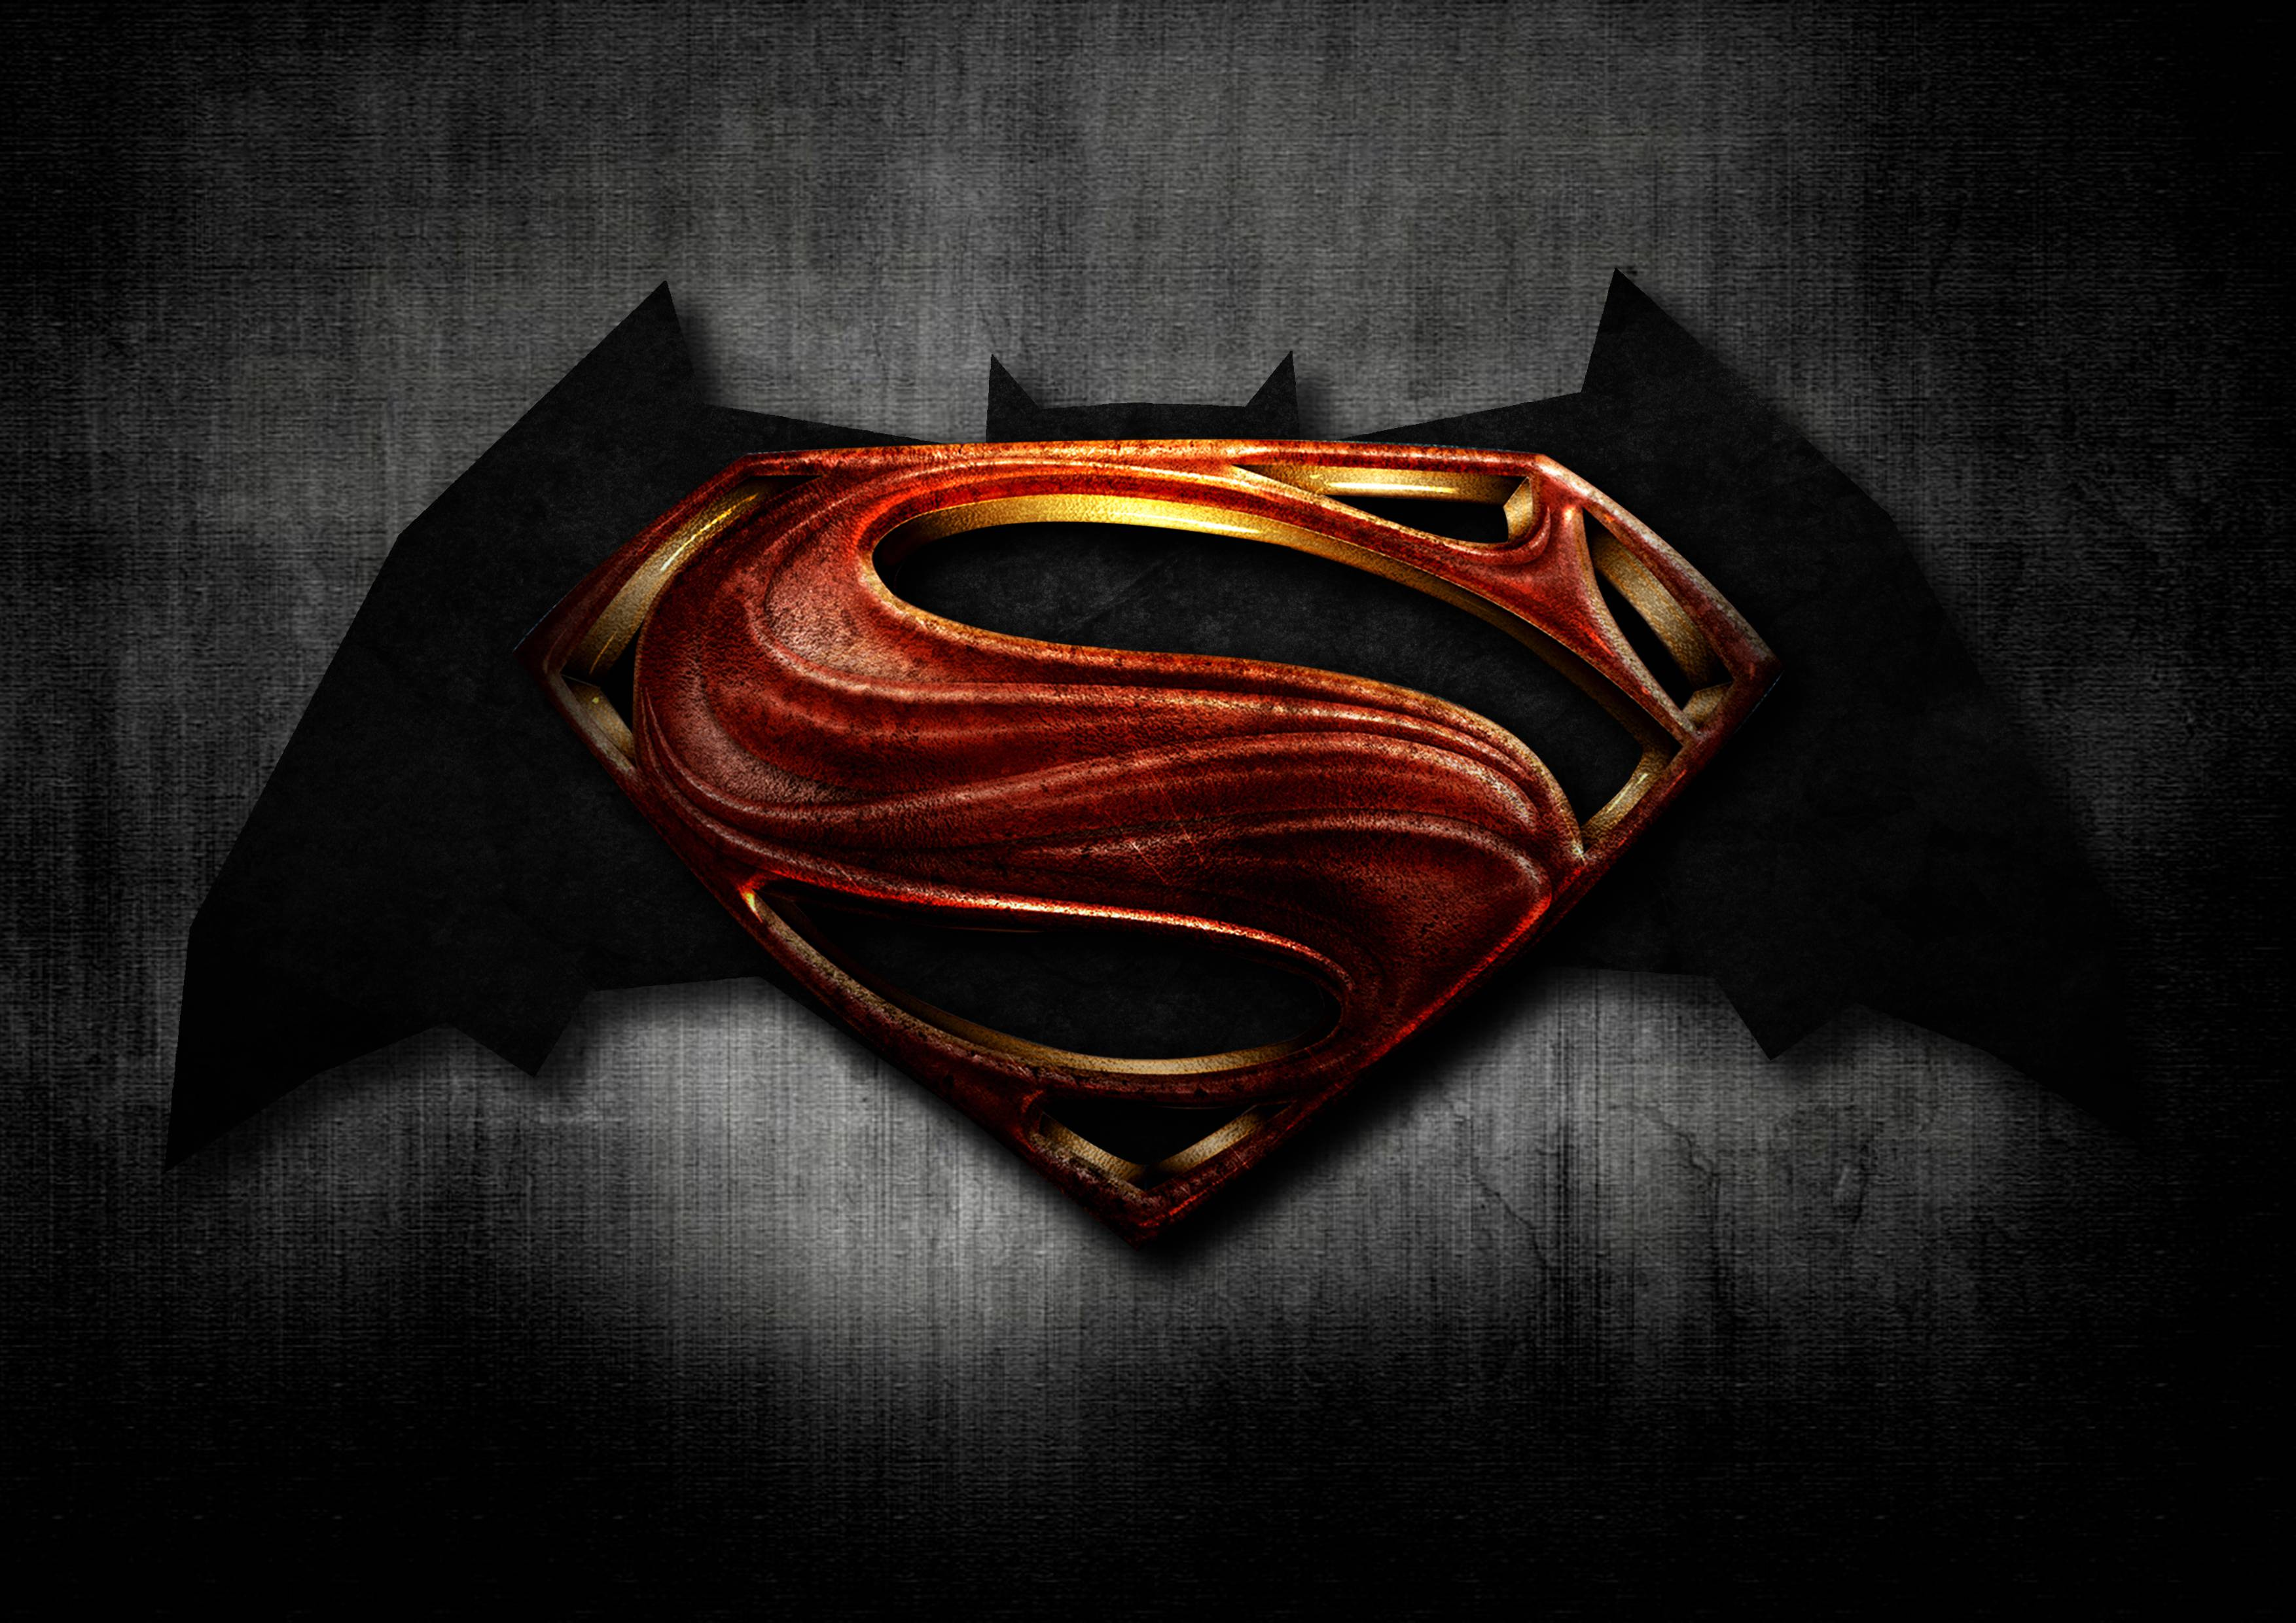 Superman 2015 Hd Wallpapers Wallpaper Cave